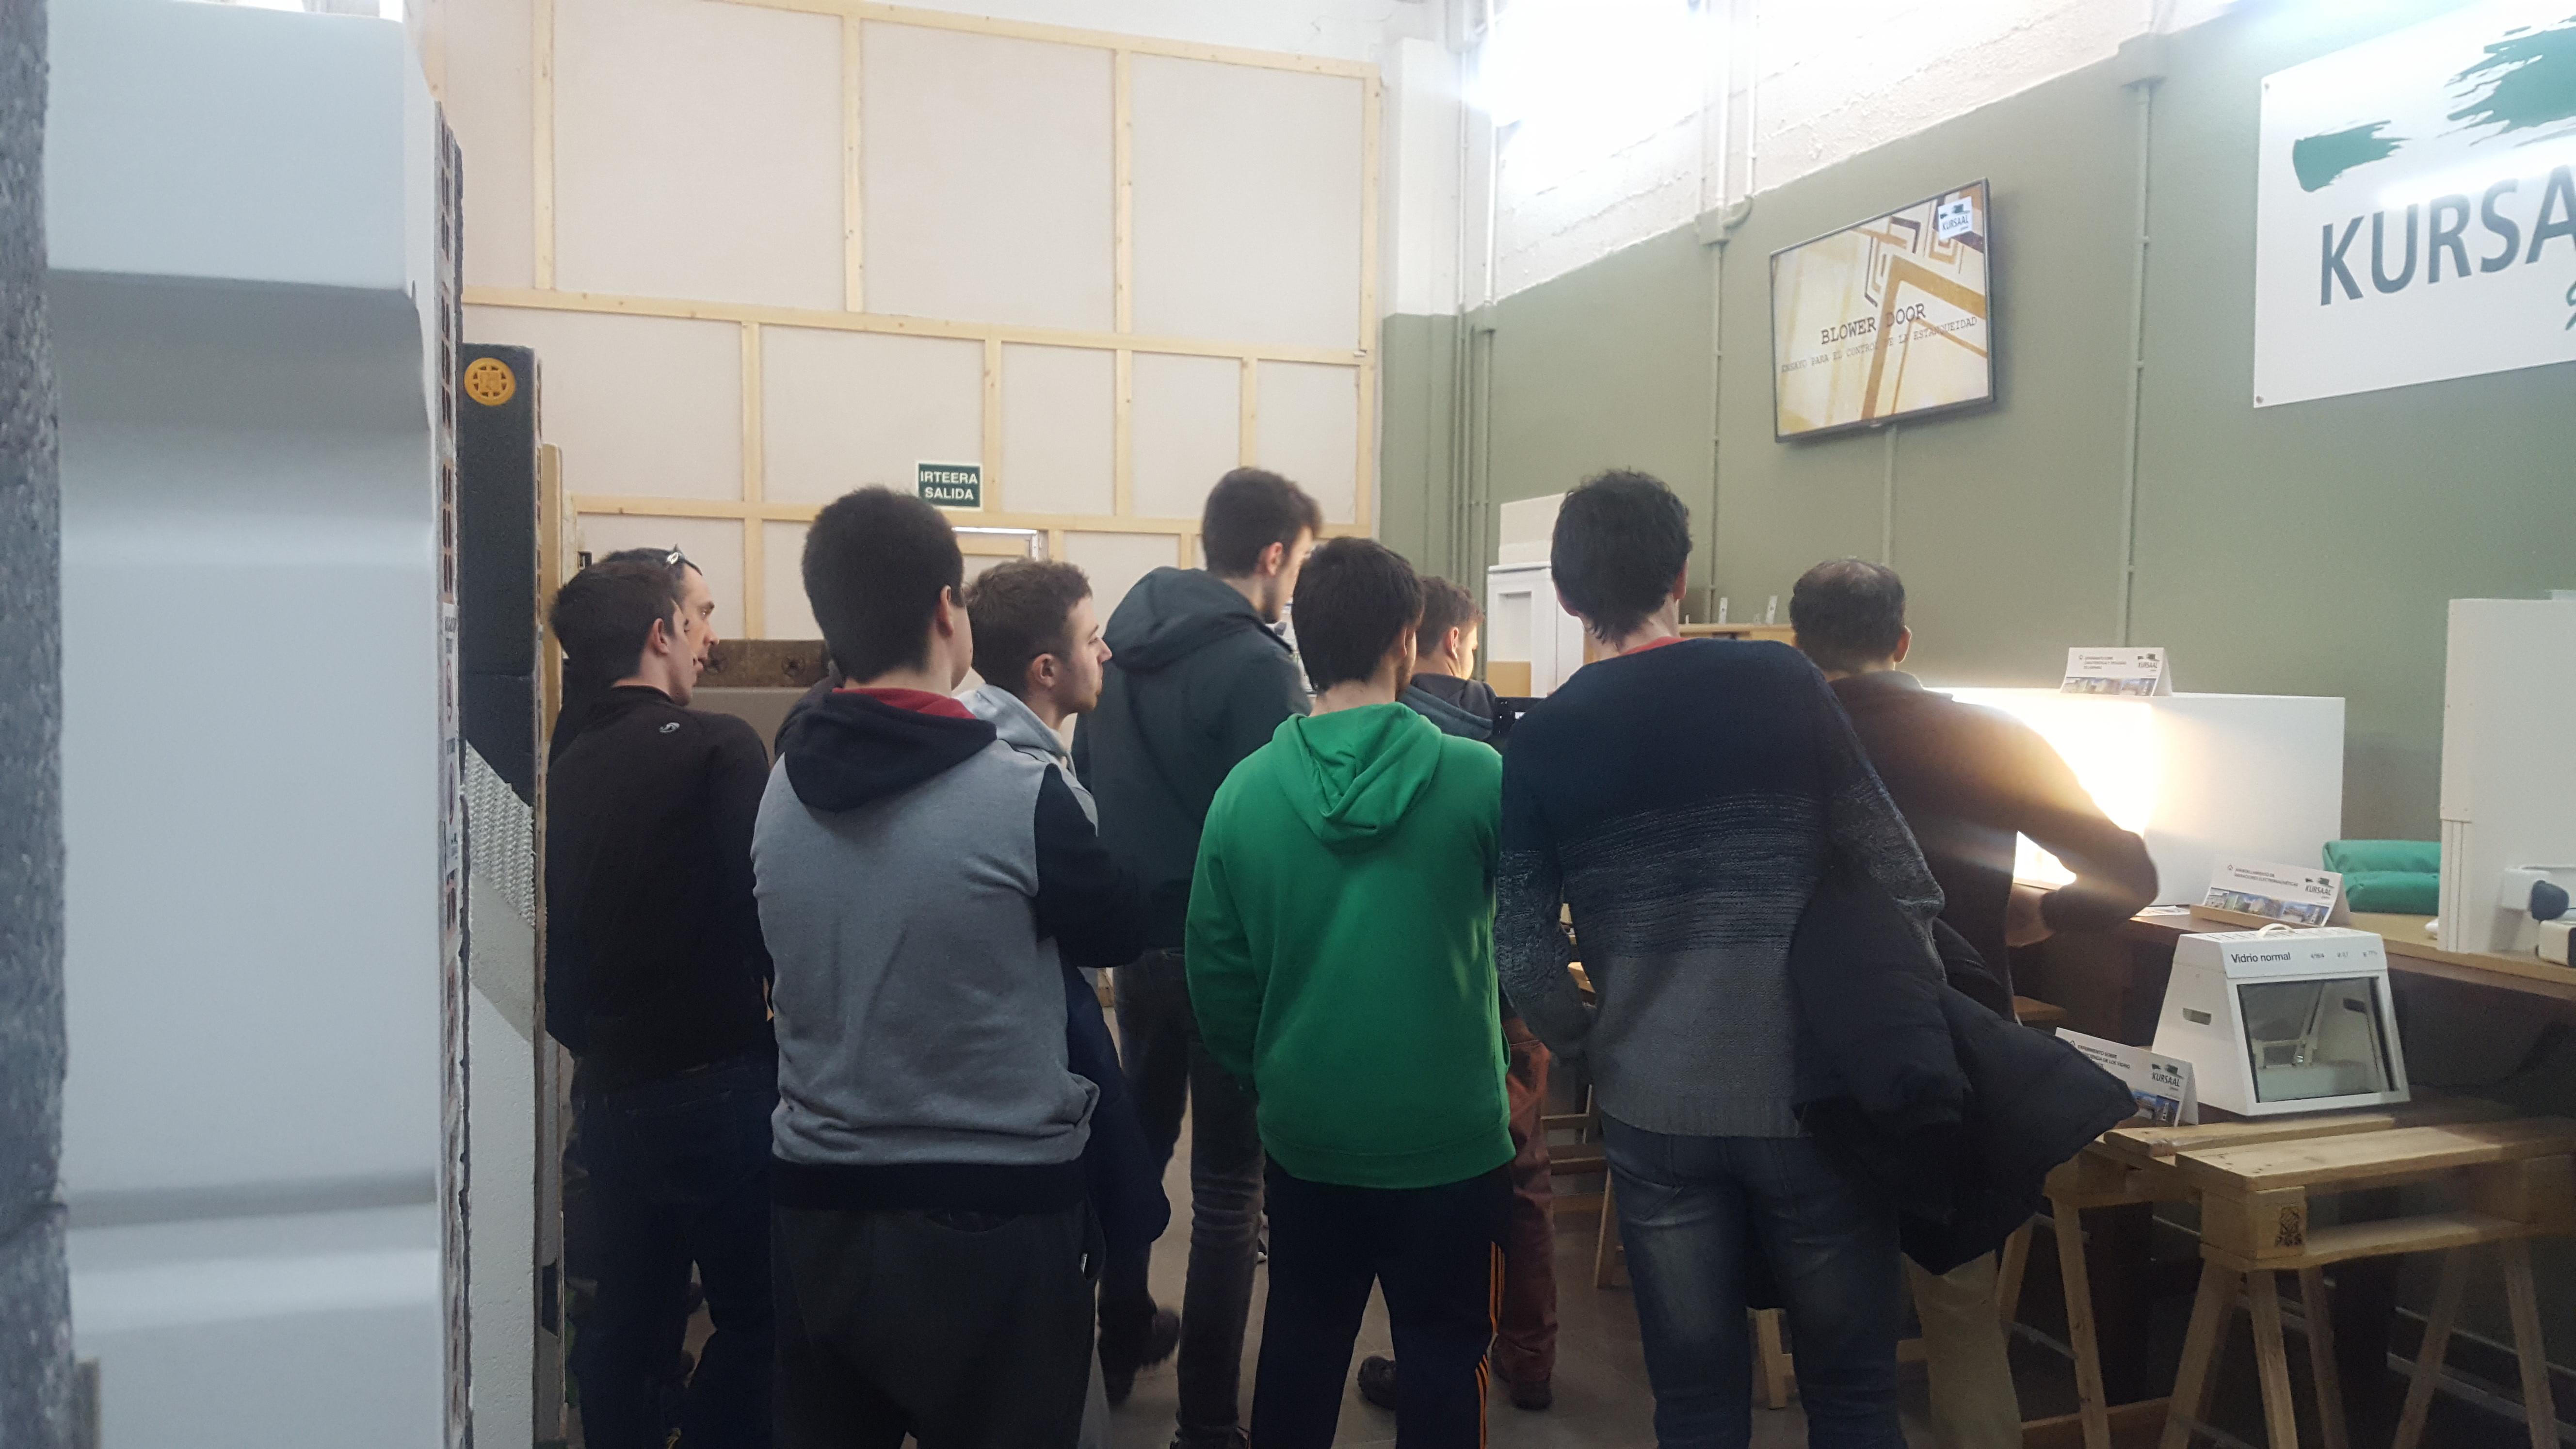 imagen 2 de noticia: alumnos-del-instituto-de-grado-superior-de-formacin-profesional-don-bosco-visitan-kursaal-green-gela